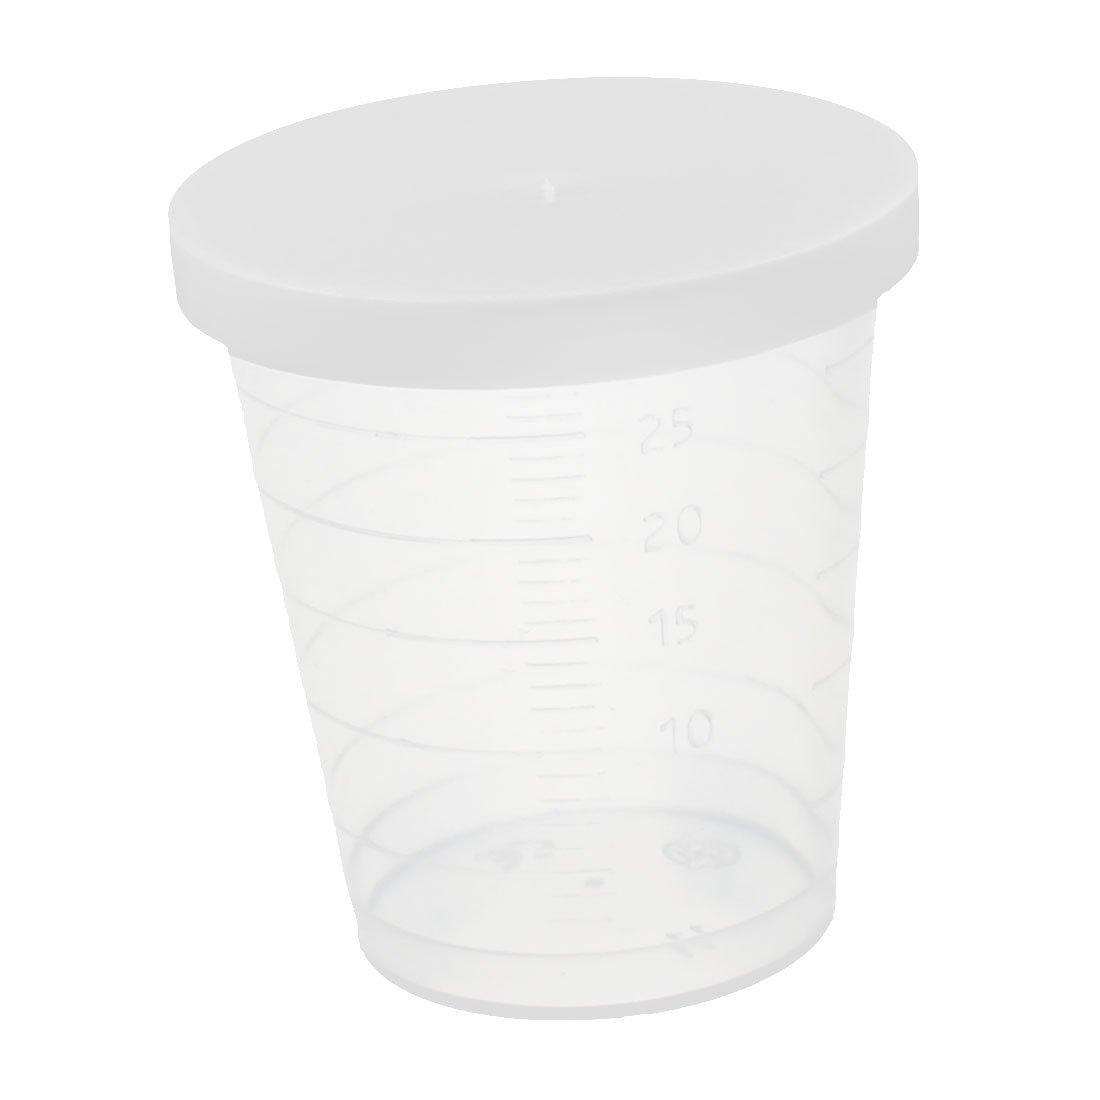 Home Mart plastic measuring cup liquid measuring cup